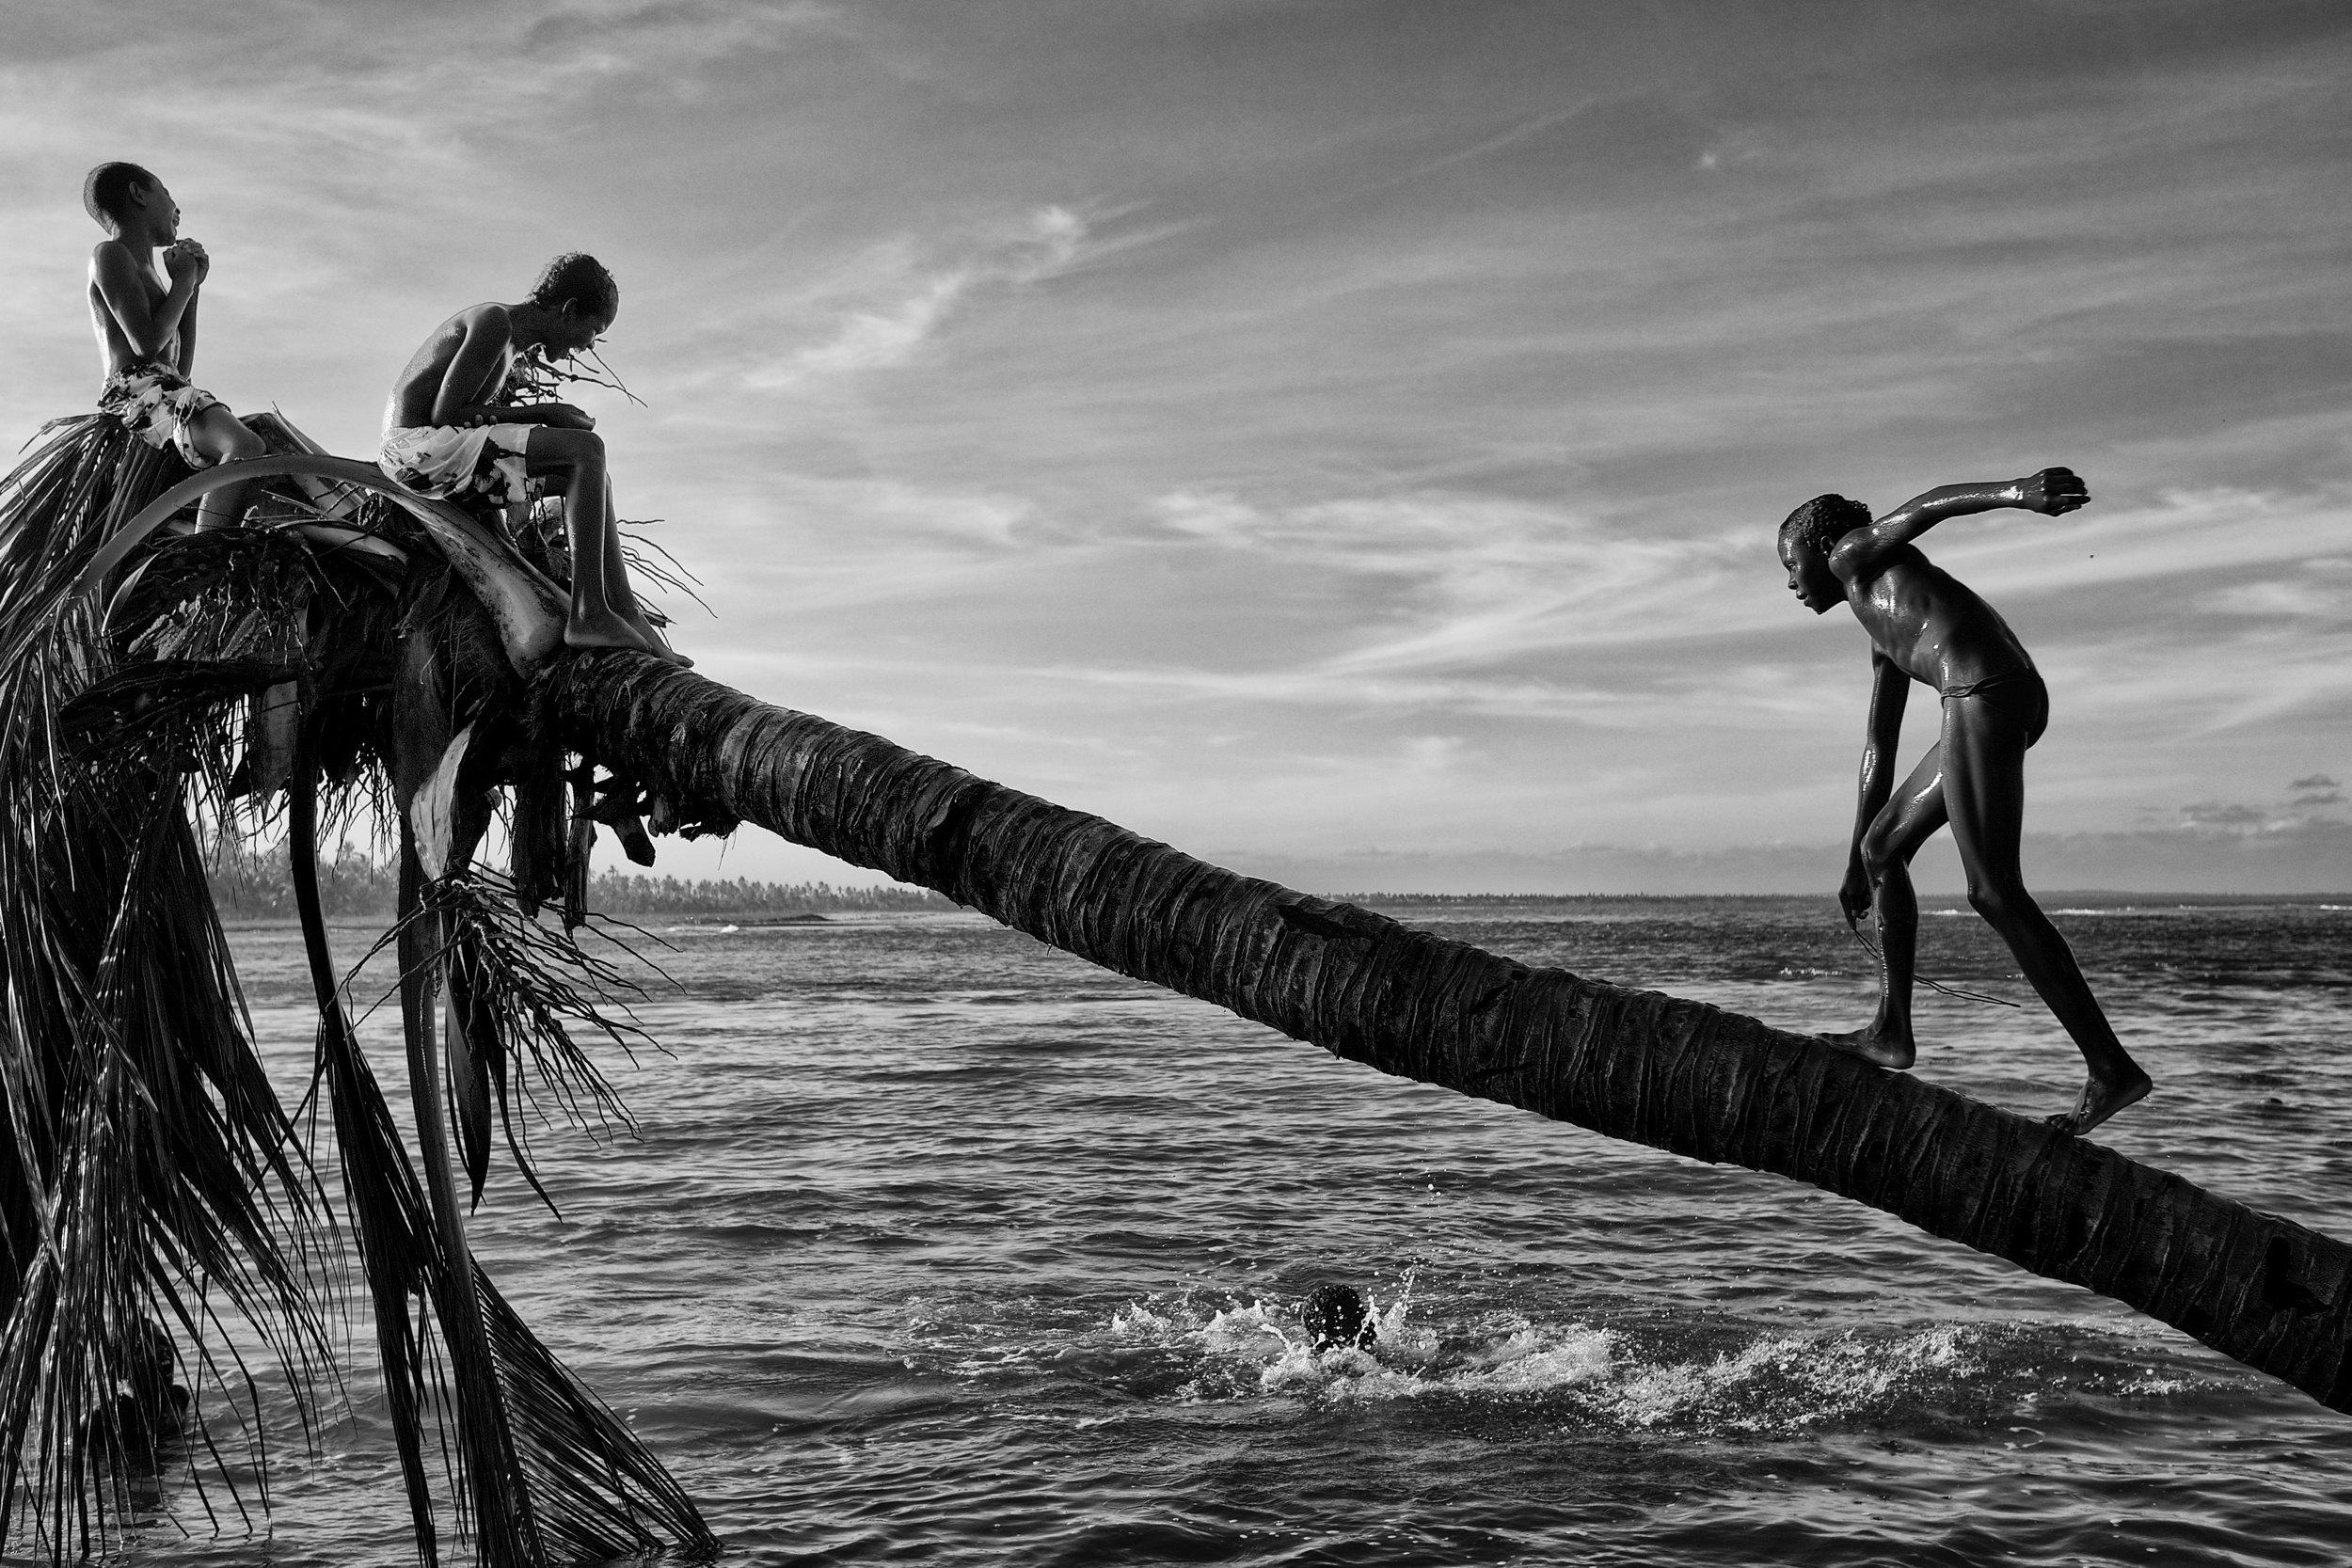 Boys bathing, Bahia, Brazil, 2012